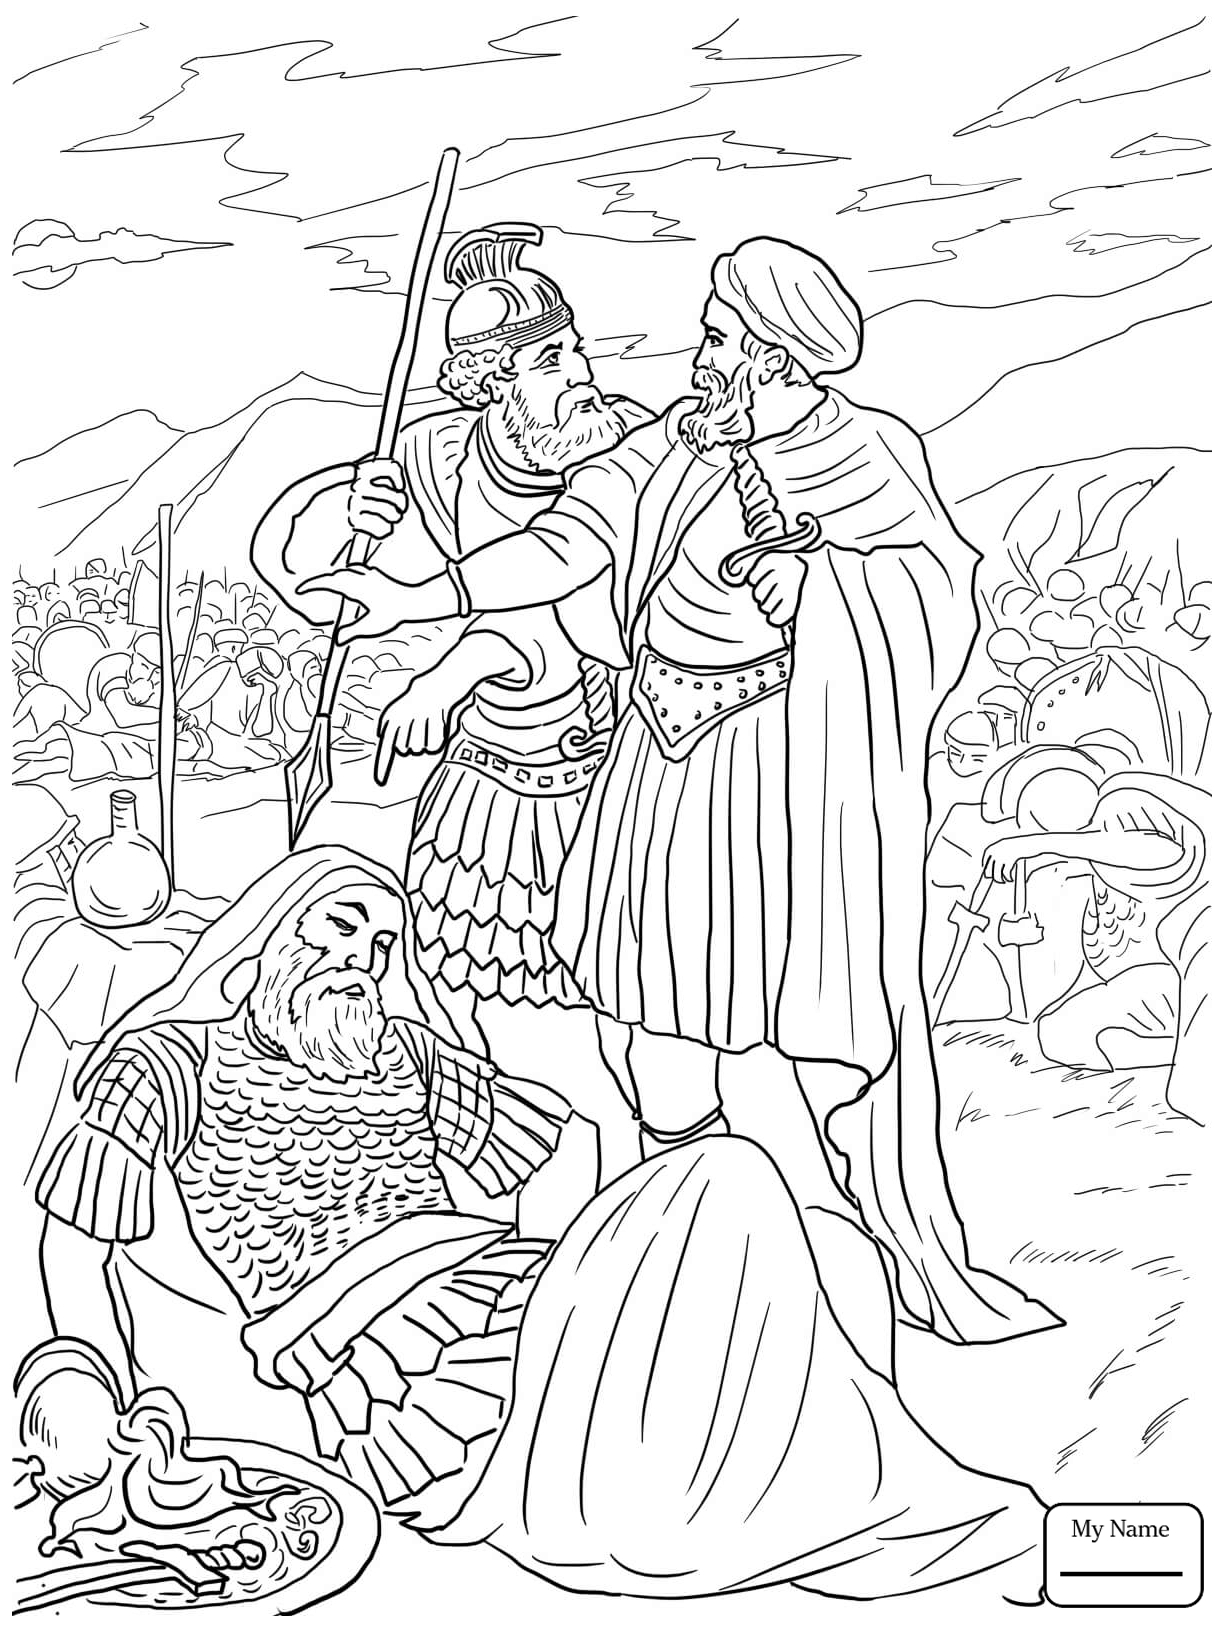 King David lesson for kids King david Ark and Sunday school